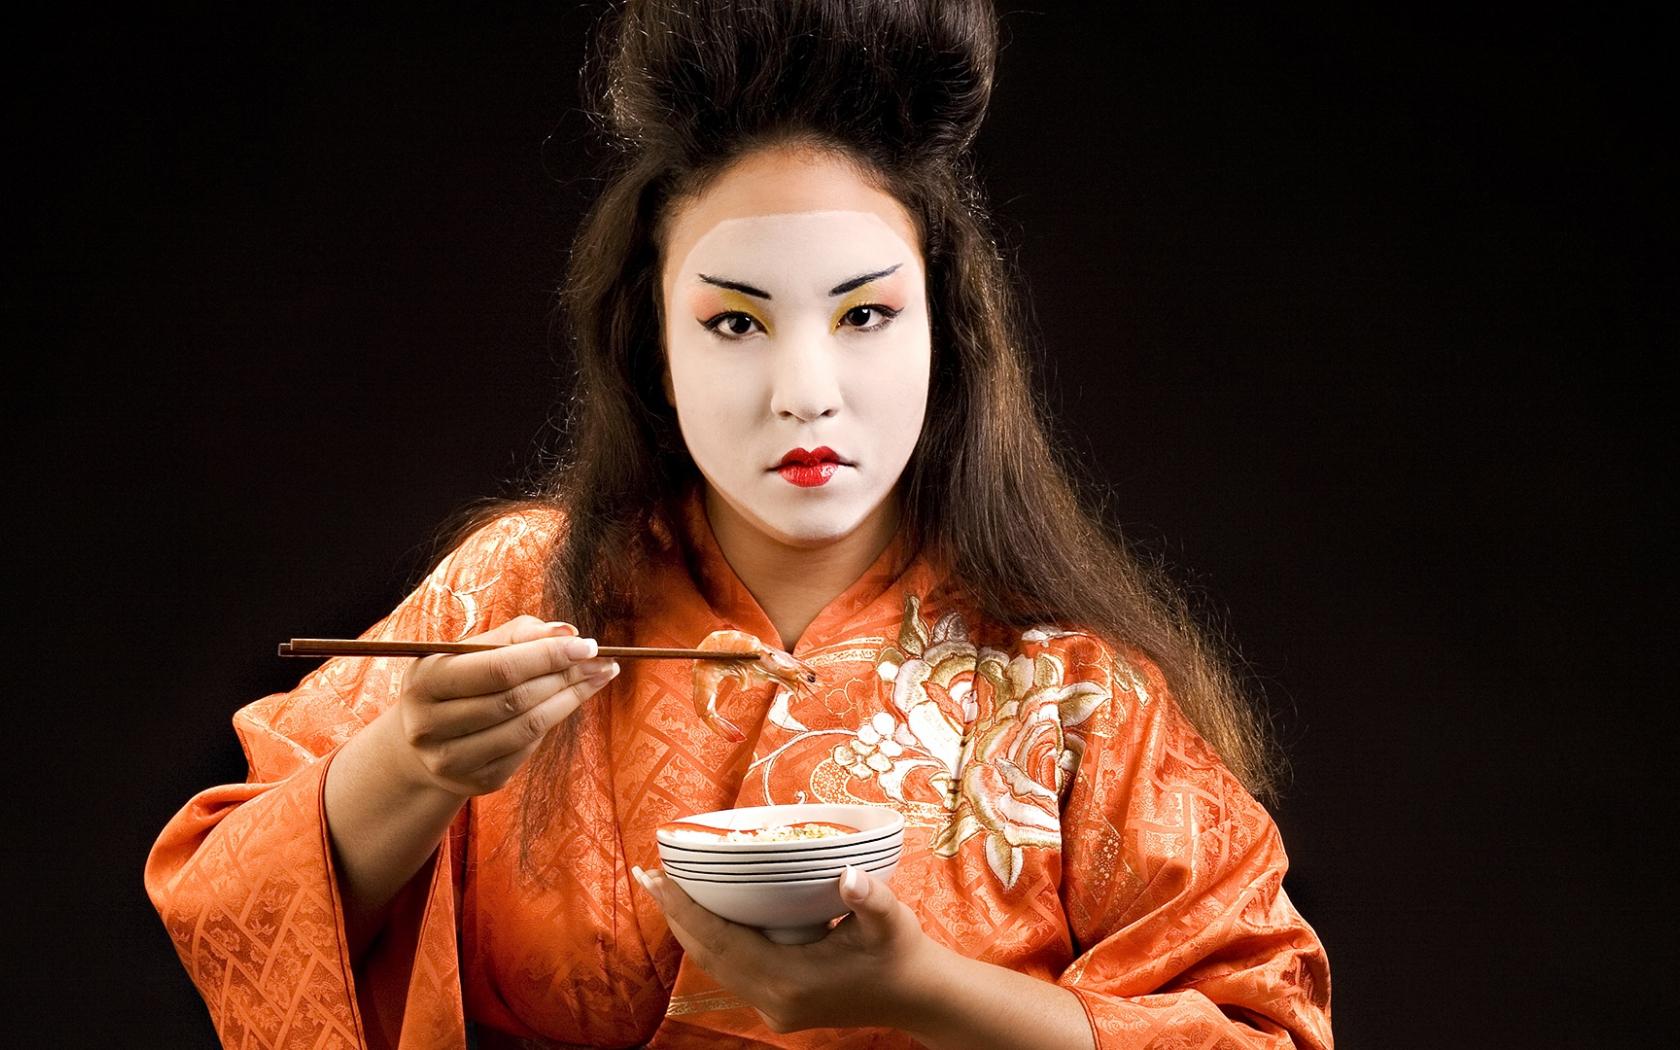 Диета Гейш Какой Рис. Изящная, как японка! До 7 кг за 5 дней на диете гейши